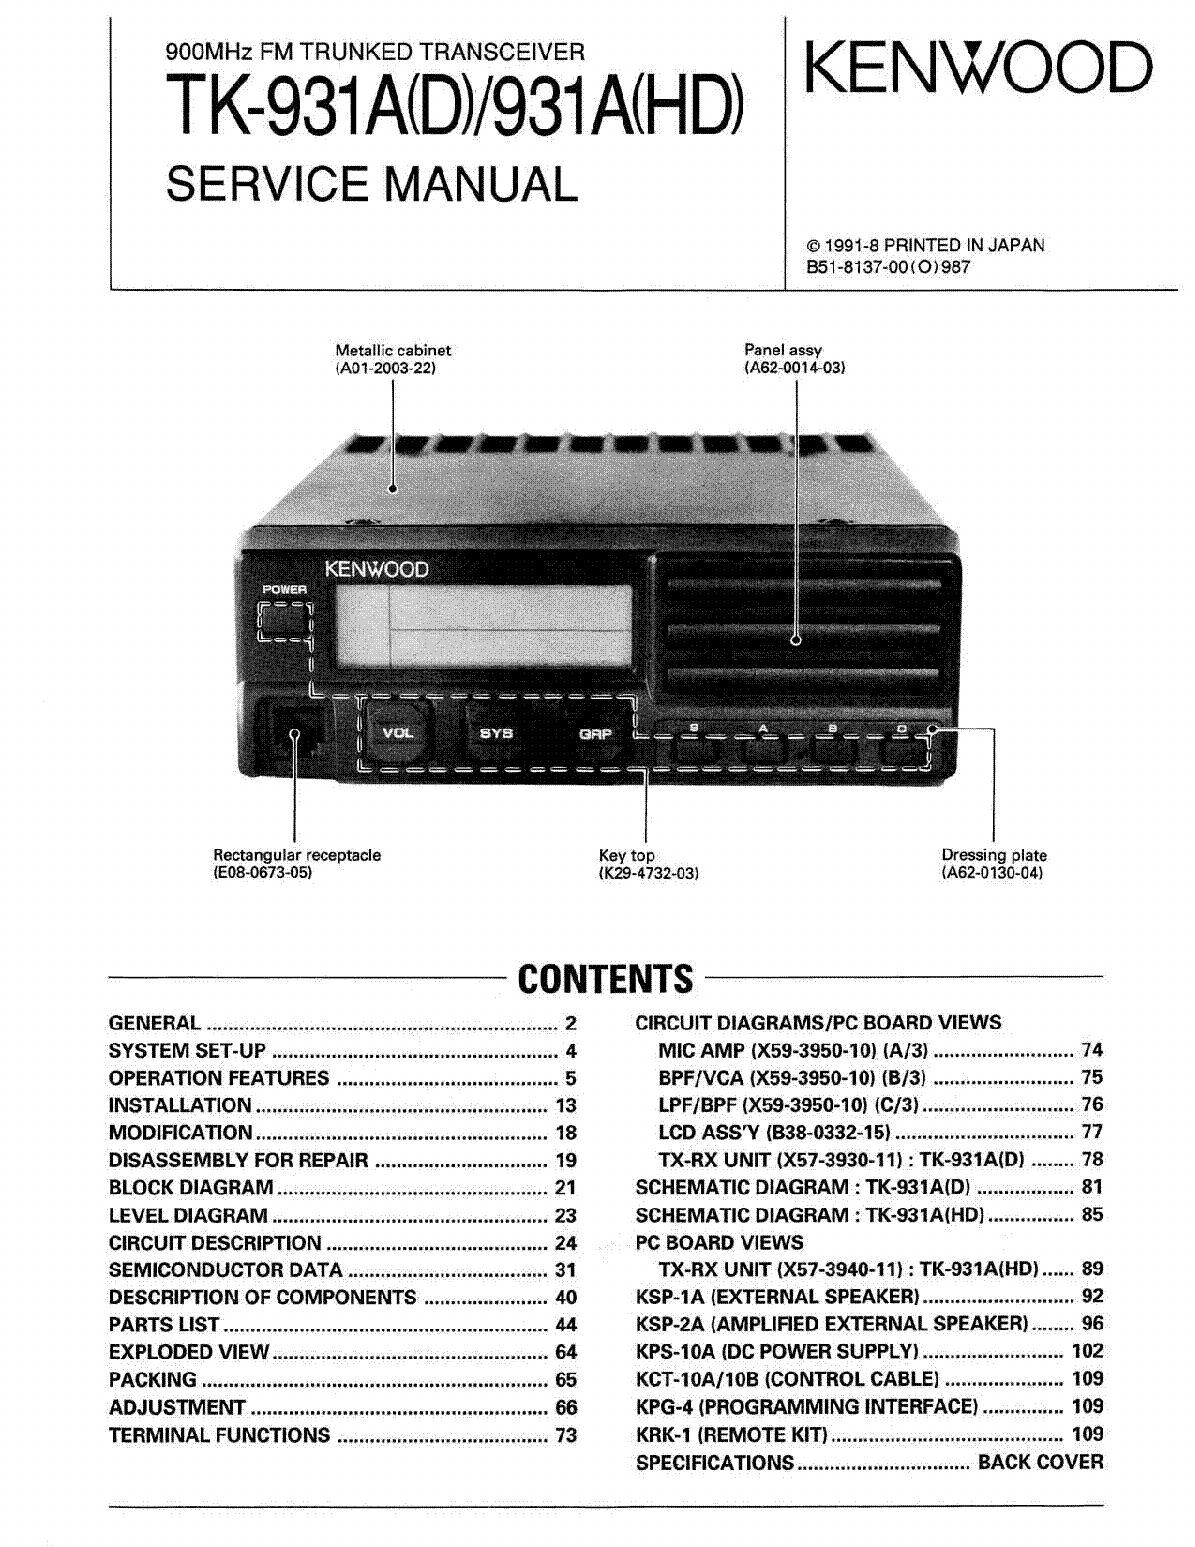 kenwood tk 931a d hd sm service manual download schematics eeprom rh elektrotanya com Kenwood Tk 7180 HK TK-7180 Software